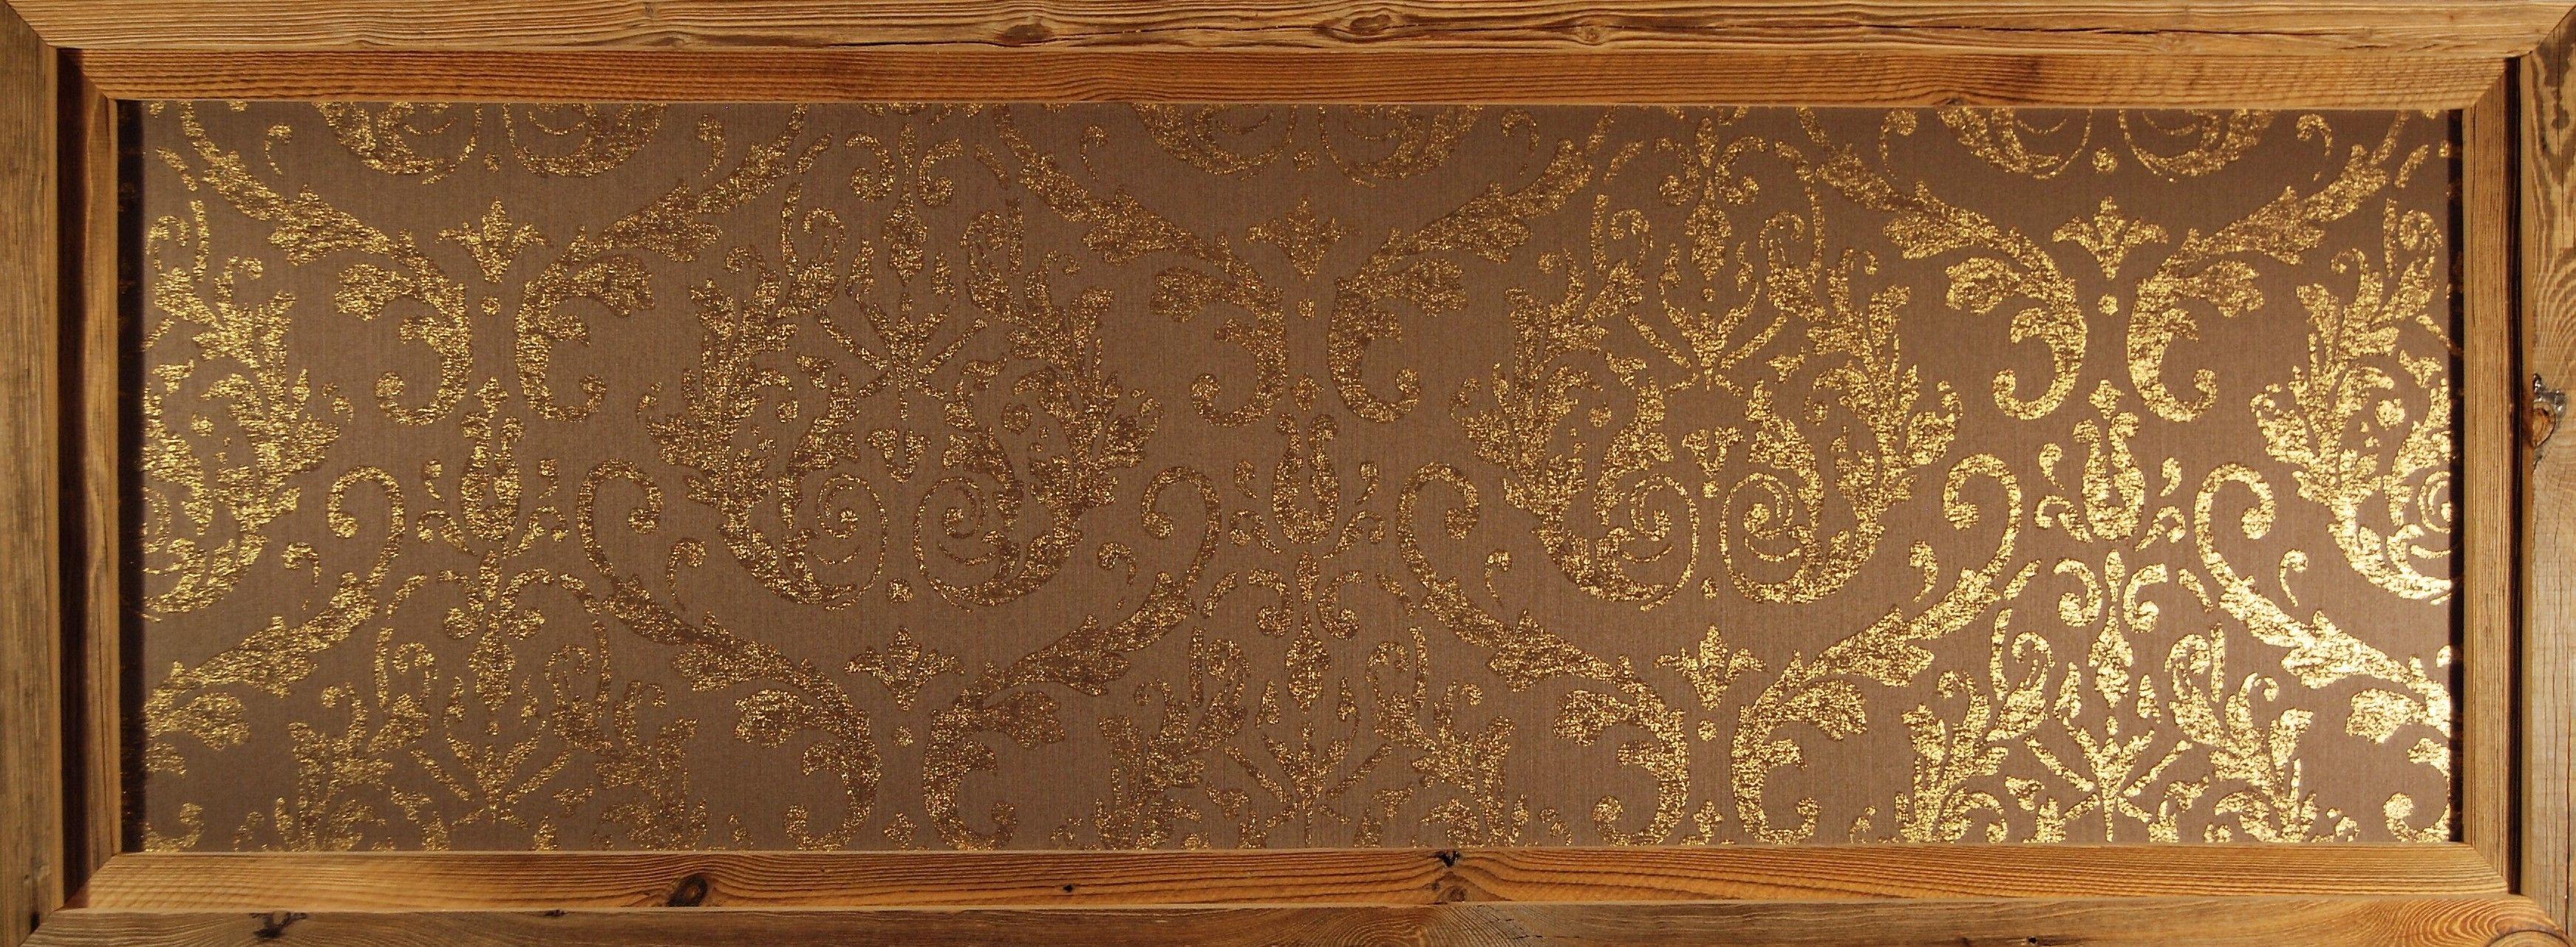 Bestell Nr 009 Omexco Elegance Wallpaper Gold Braun Textil